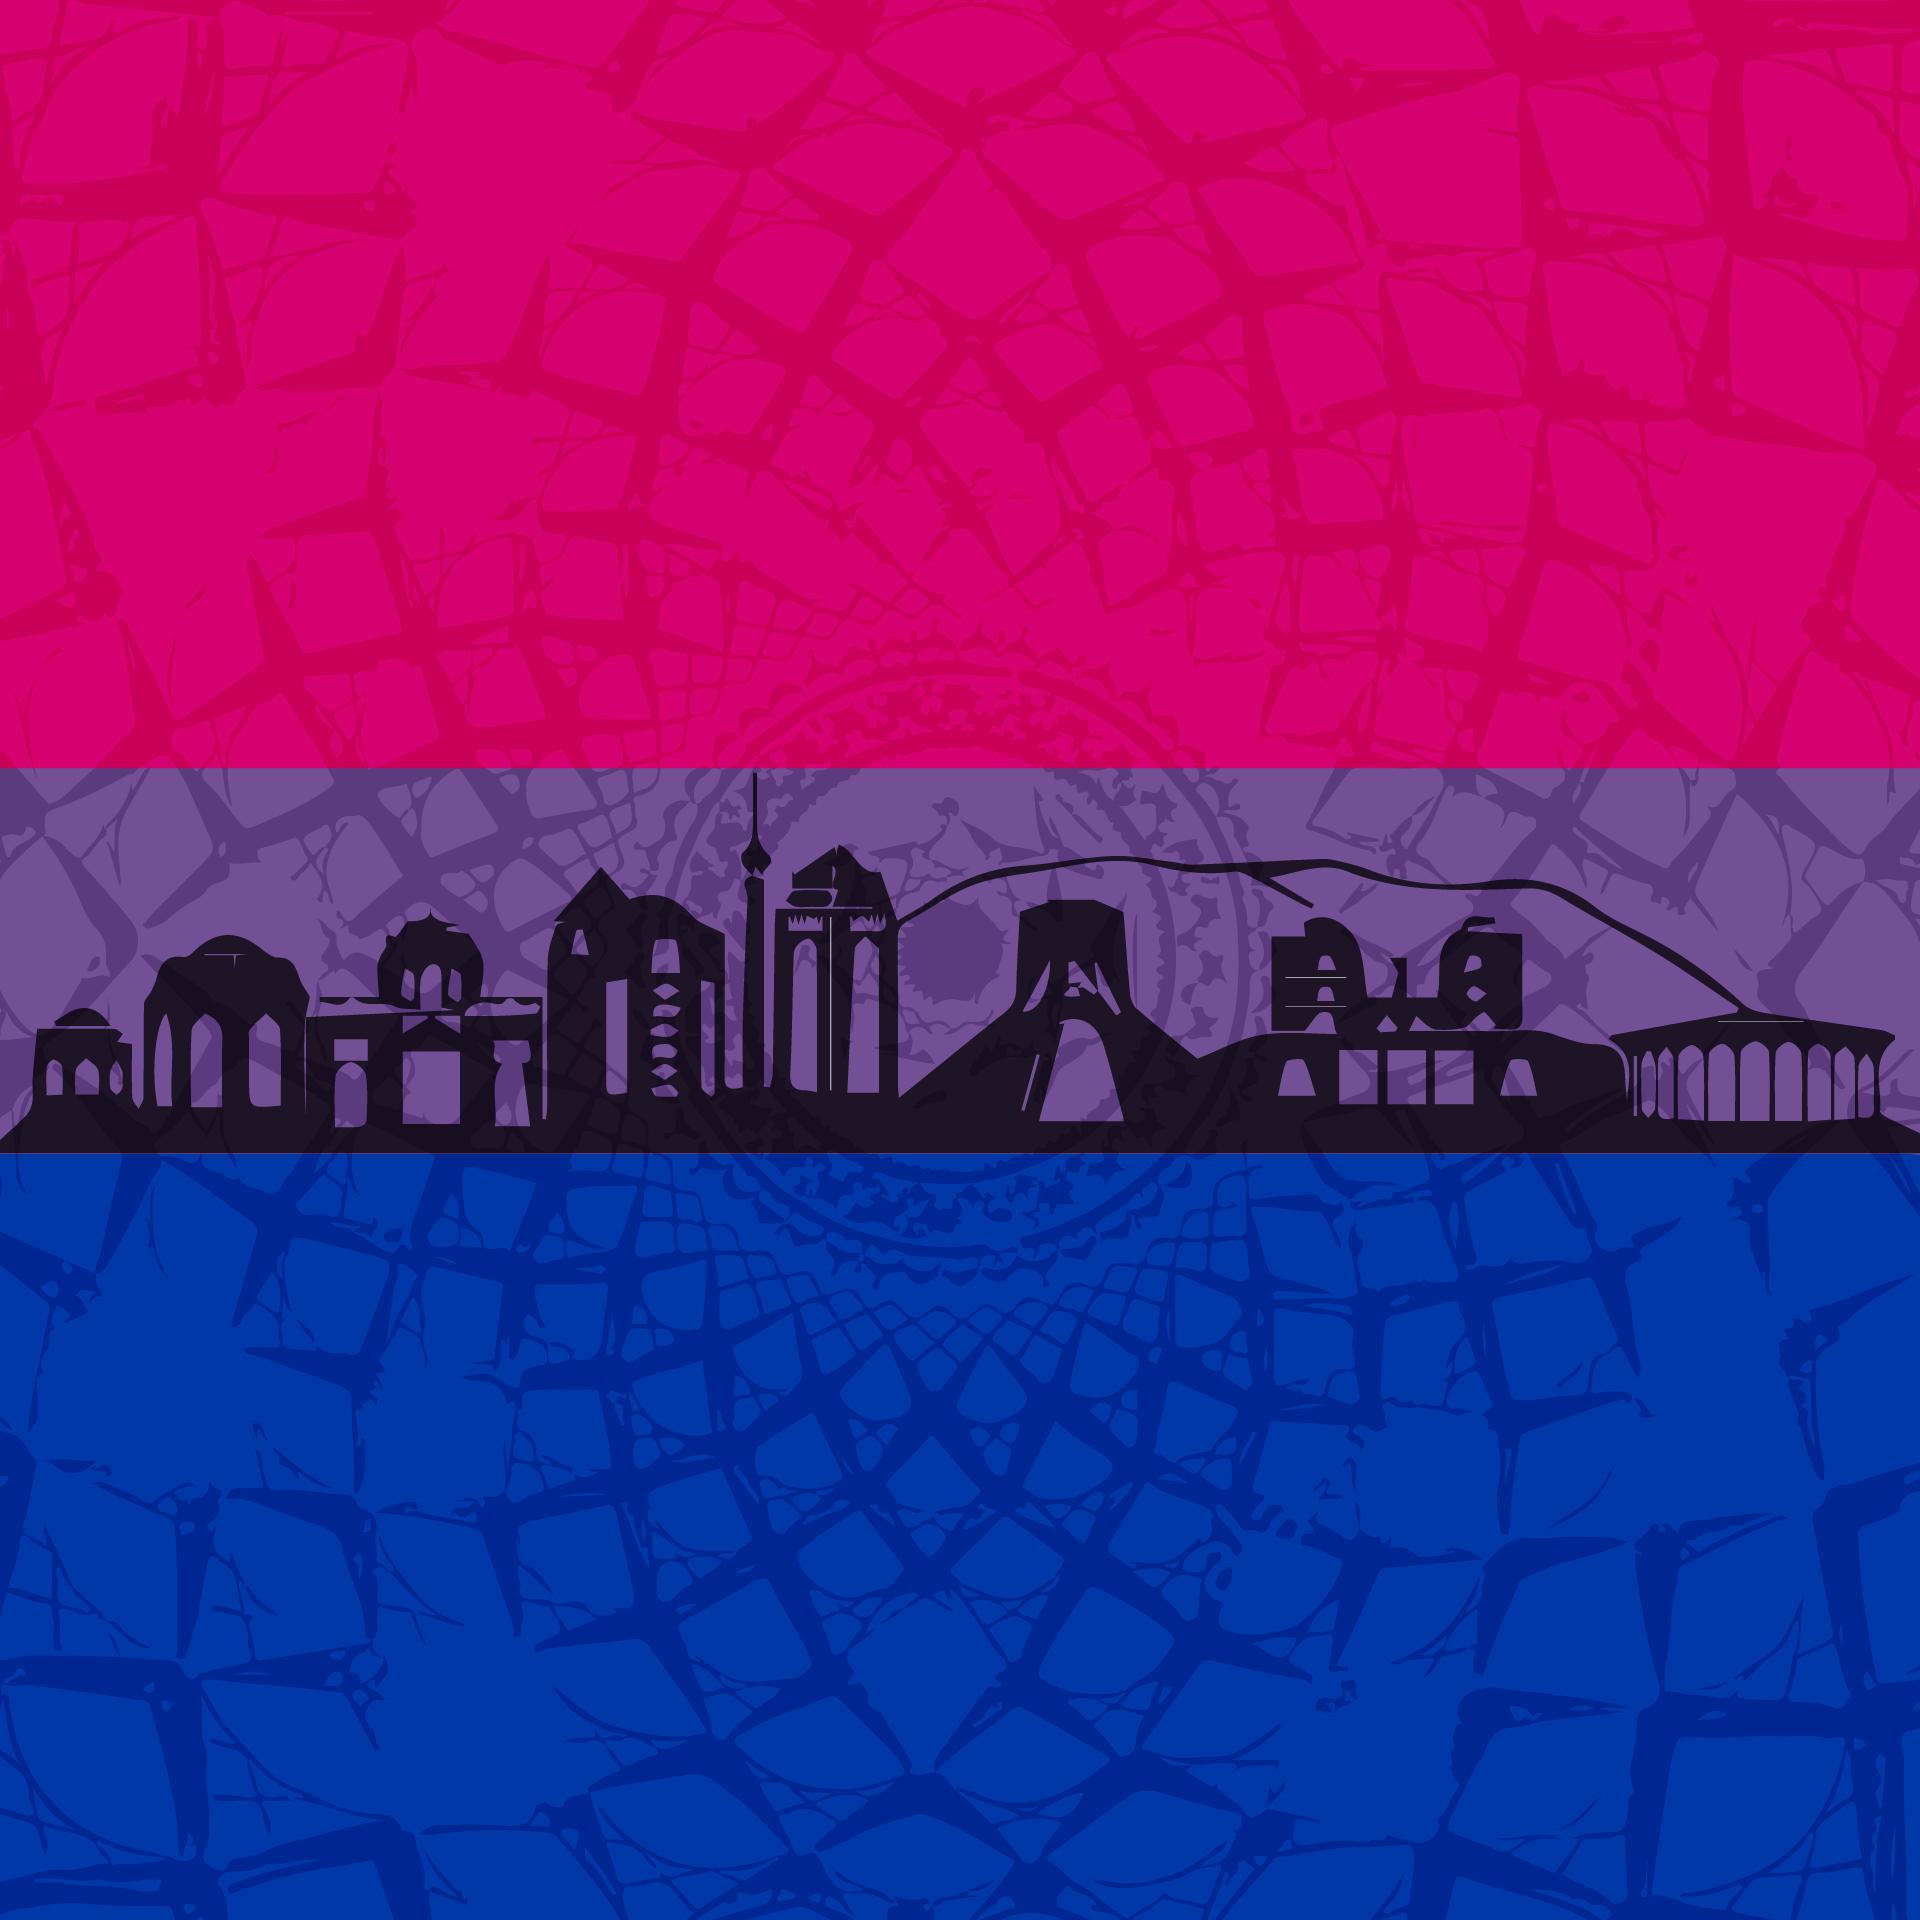 ۲۳ سپتامبر روز مشاهدهپذیری دوجنسگرایان